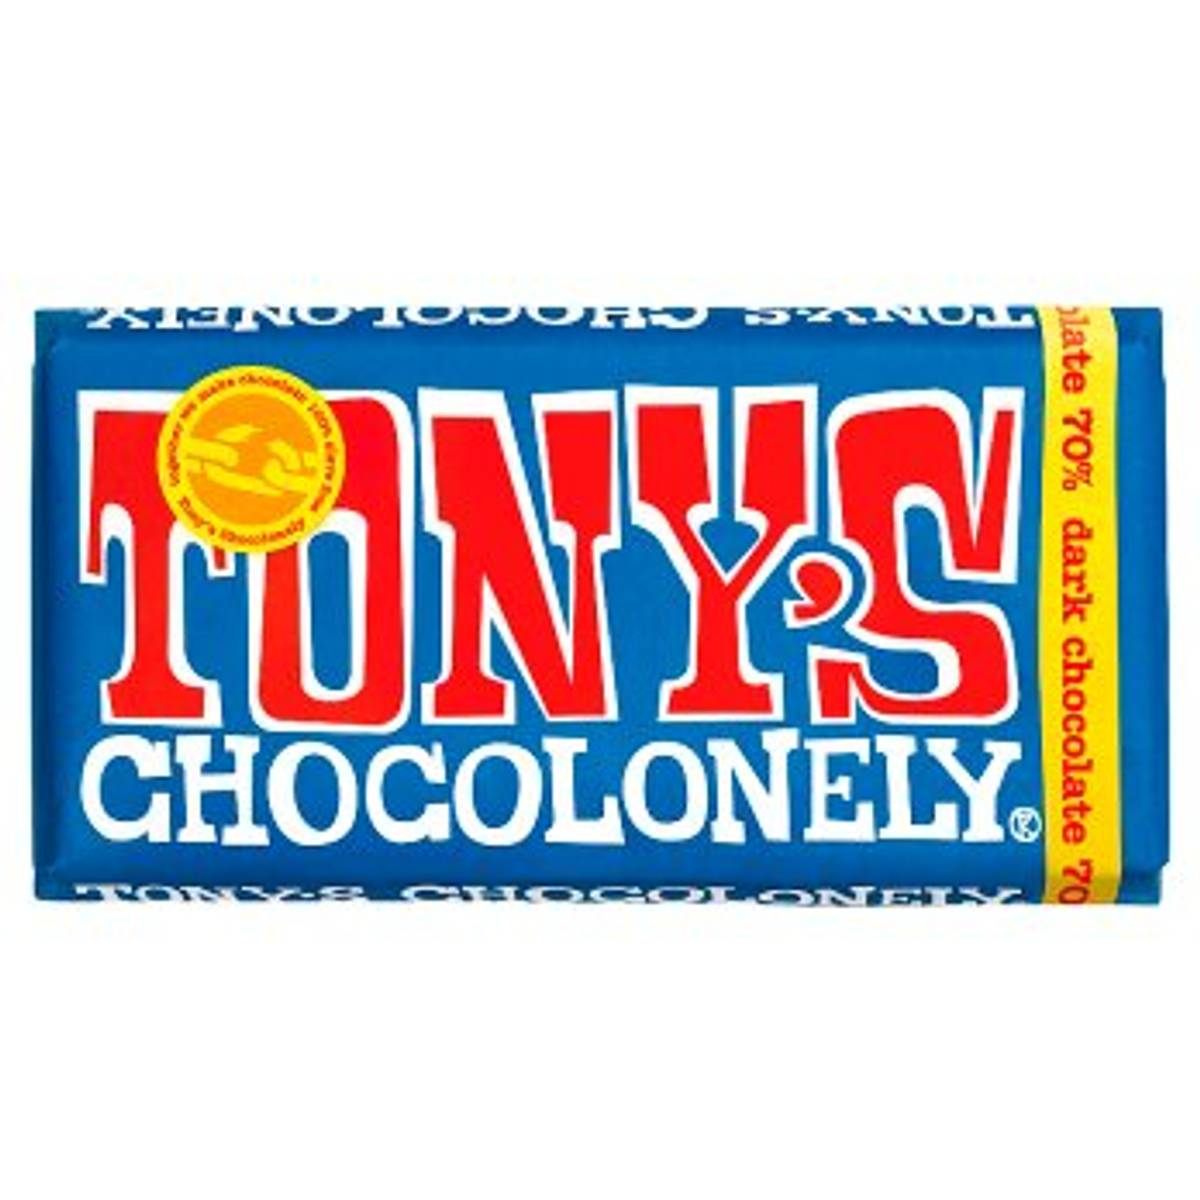 Mørk sjokolade 180g, Fair Trade / Tony